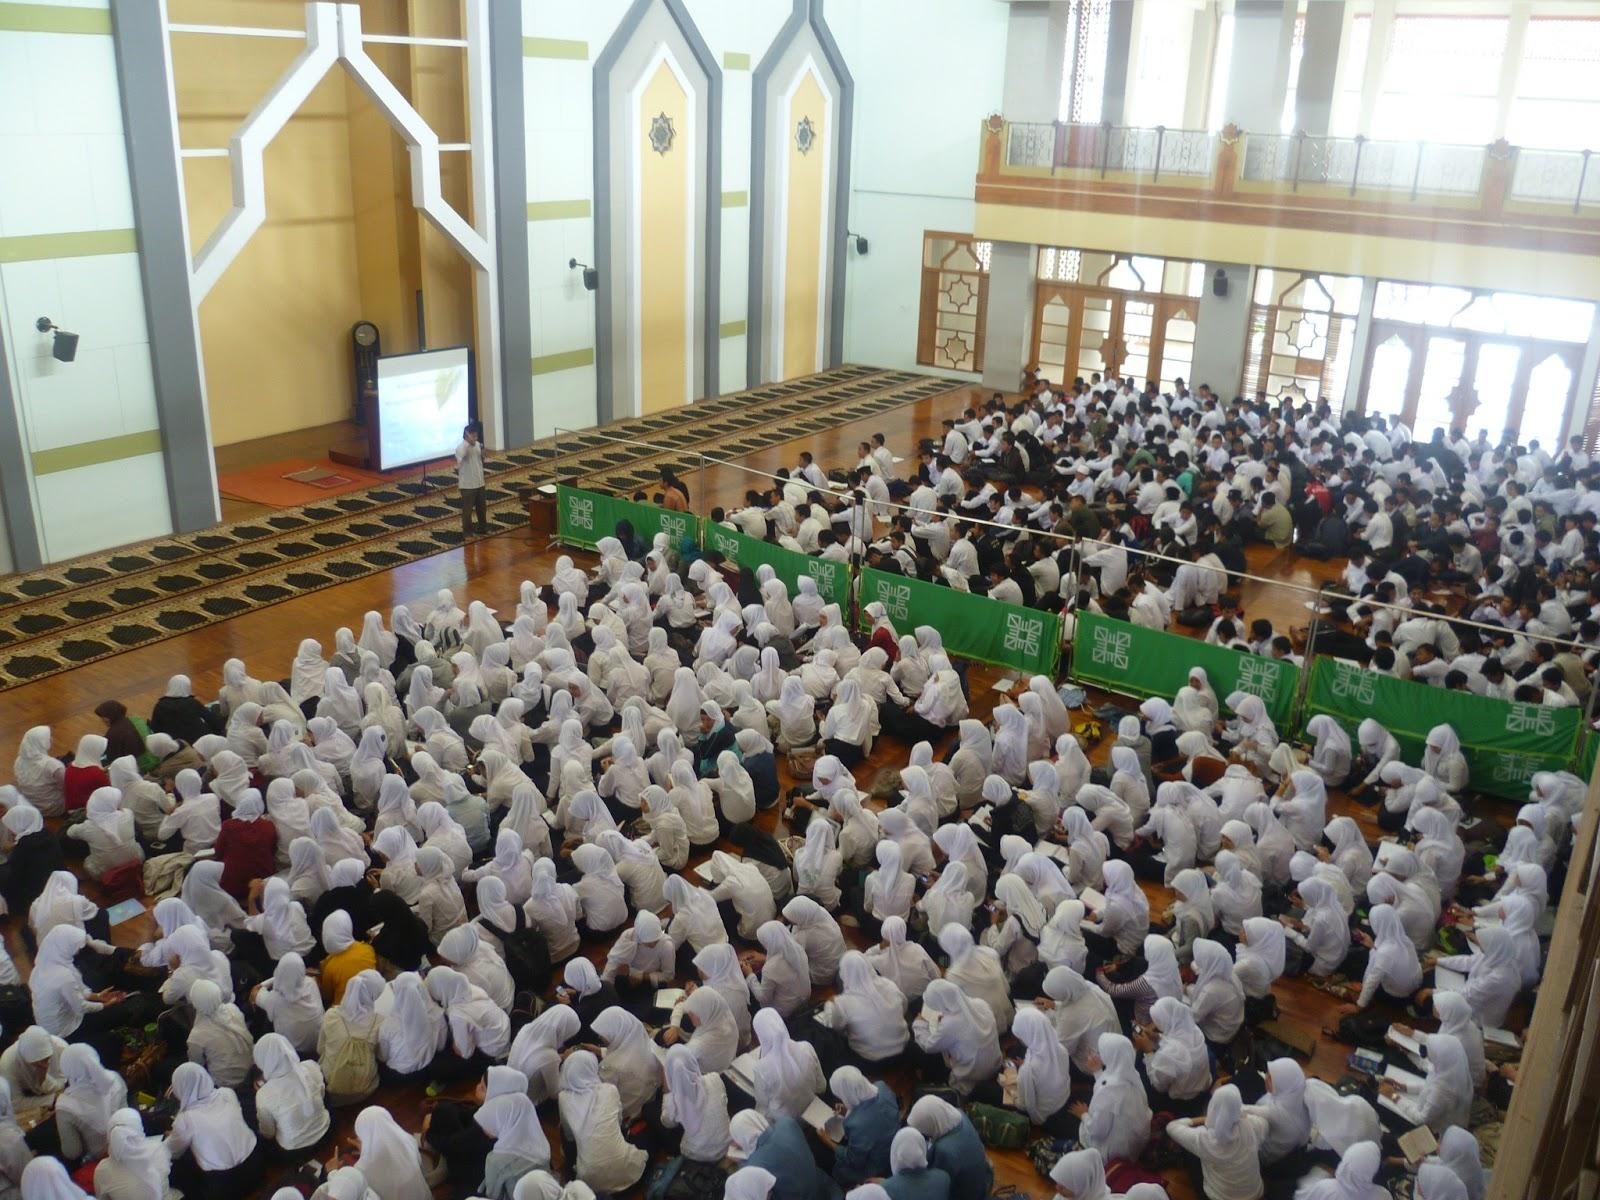 Mengenal Gedung UPI - Masjid Al-Furqan